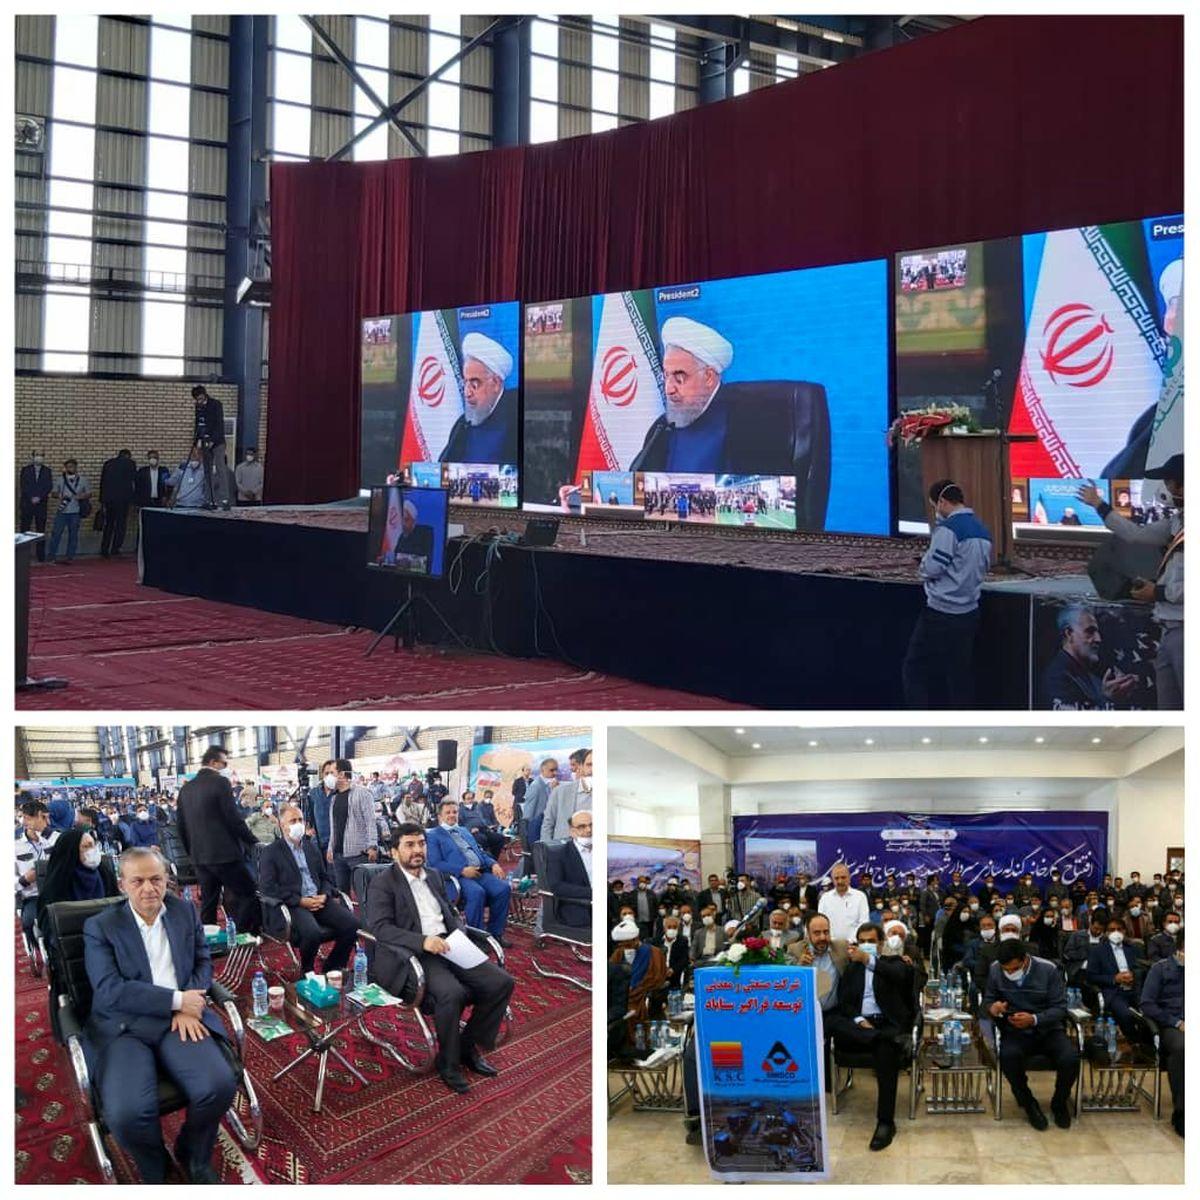 افتتاح دو کارخانه فولادی سنگان